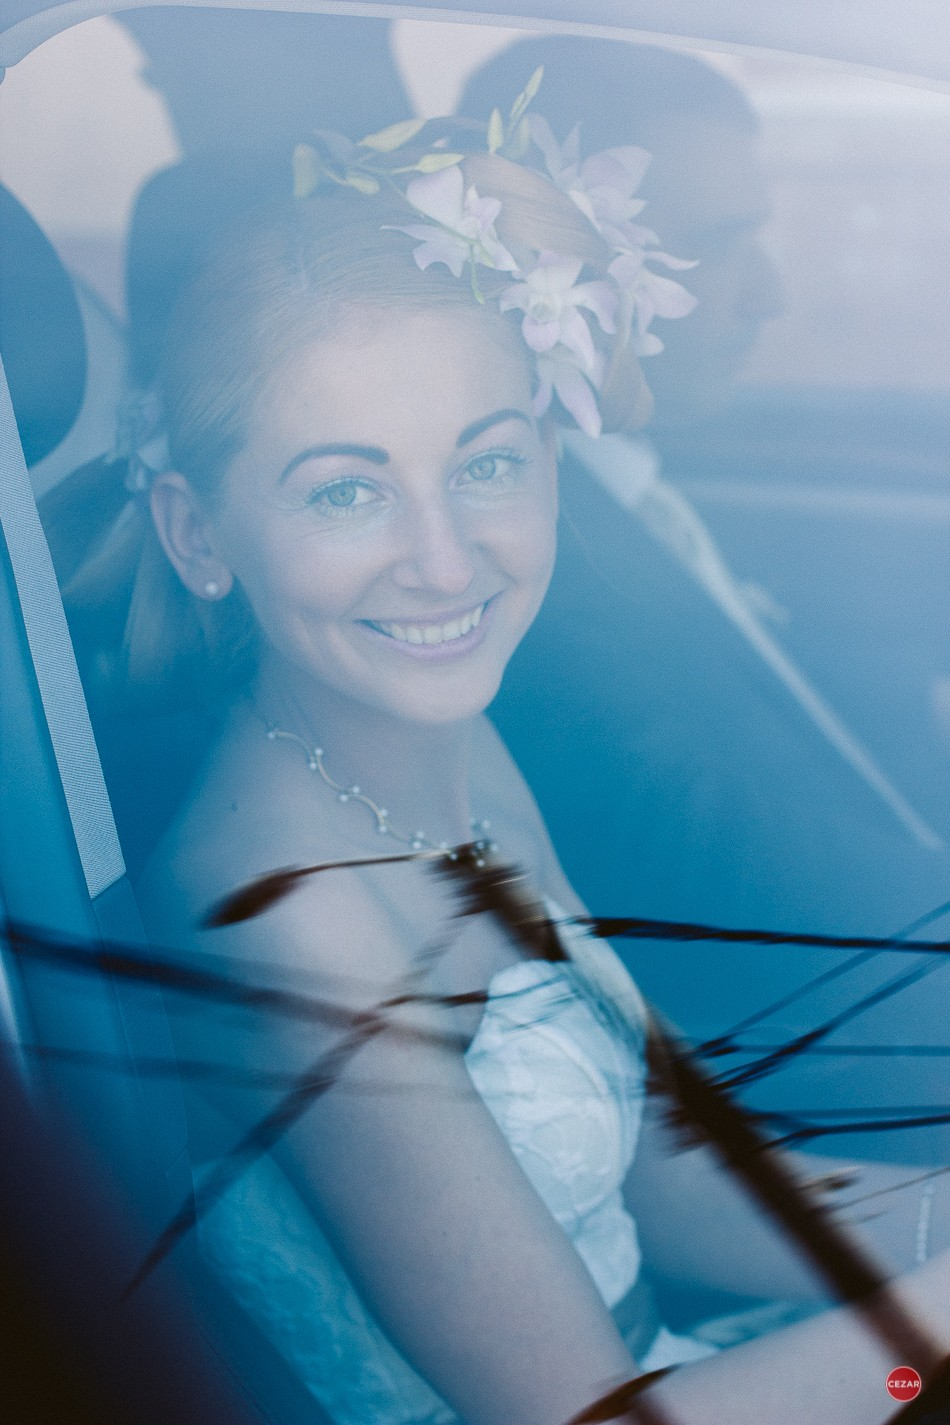 nunta attila si andreea fotograf licentiat profesionist de nunta fotografie creativa grand hotel targu mures cluj bistrita (47)